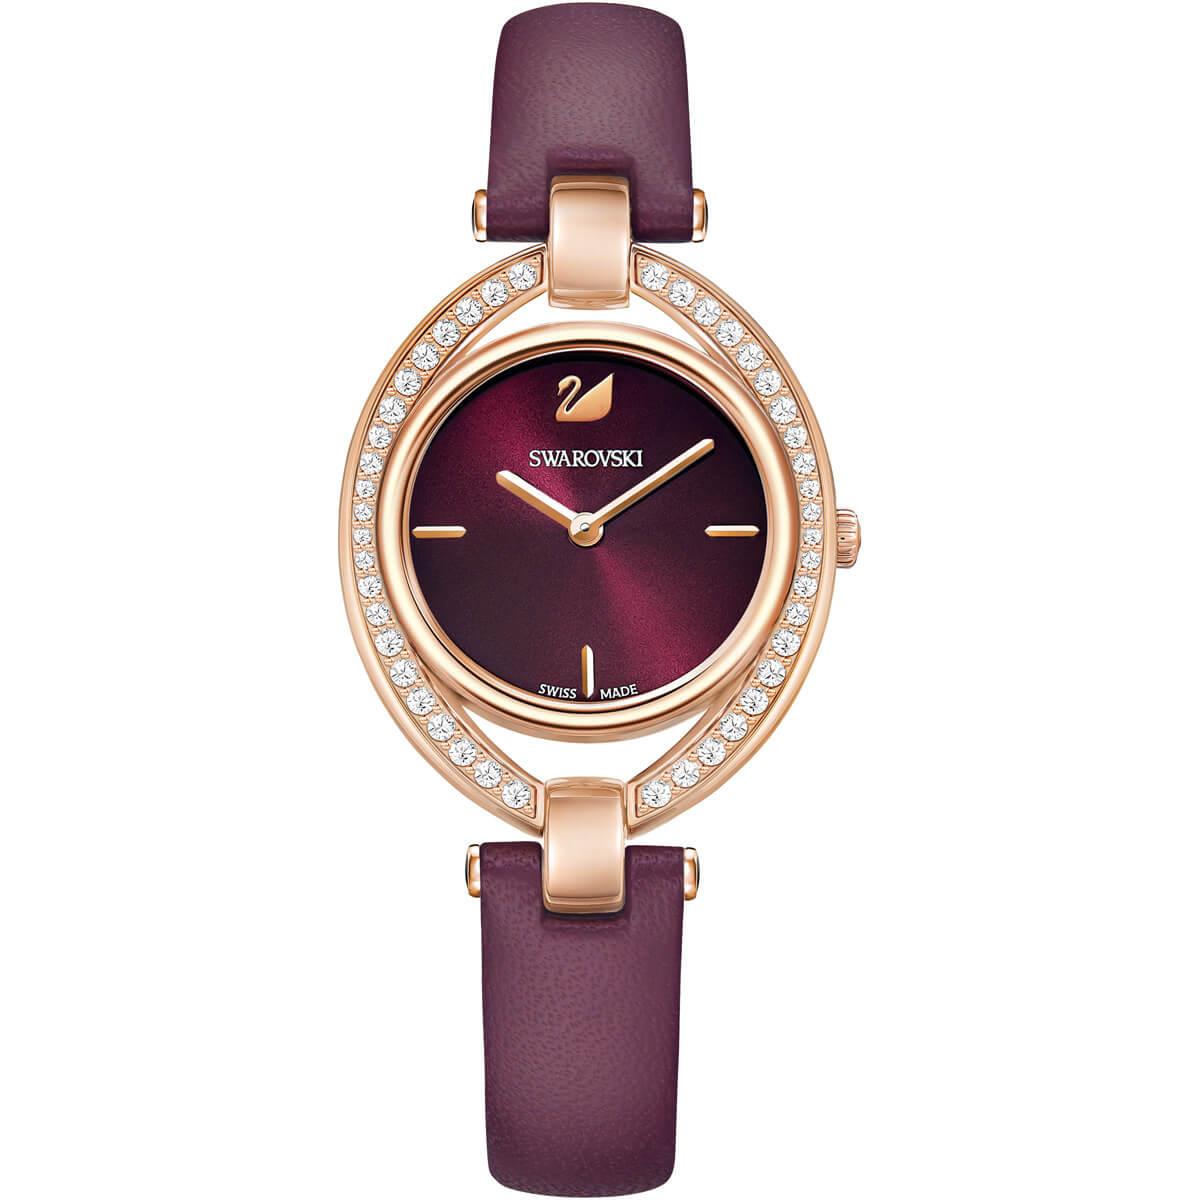 SWAROVSKI 施華洛世奇 STELLA 晶鑽腕錶 5376839 酒紅 / 29X35mm 0